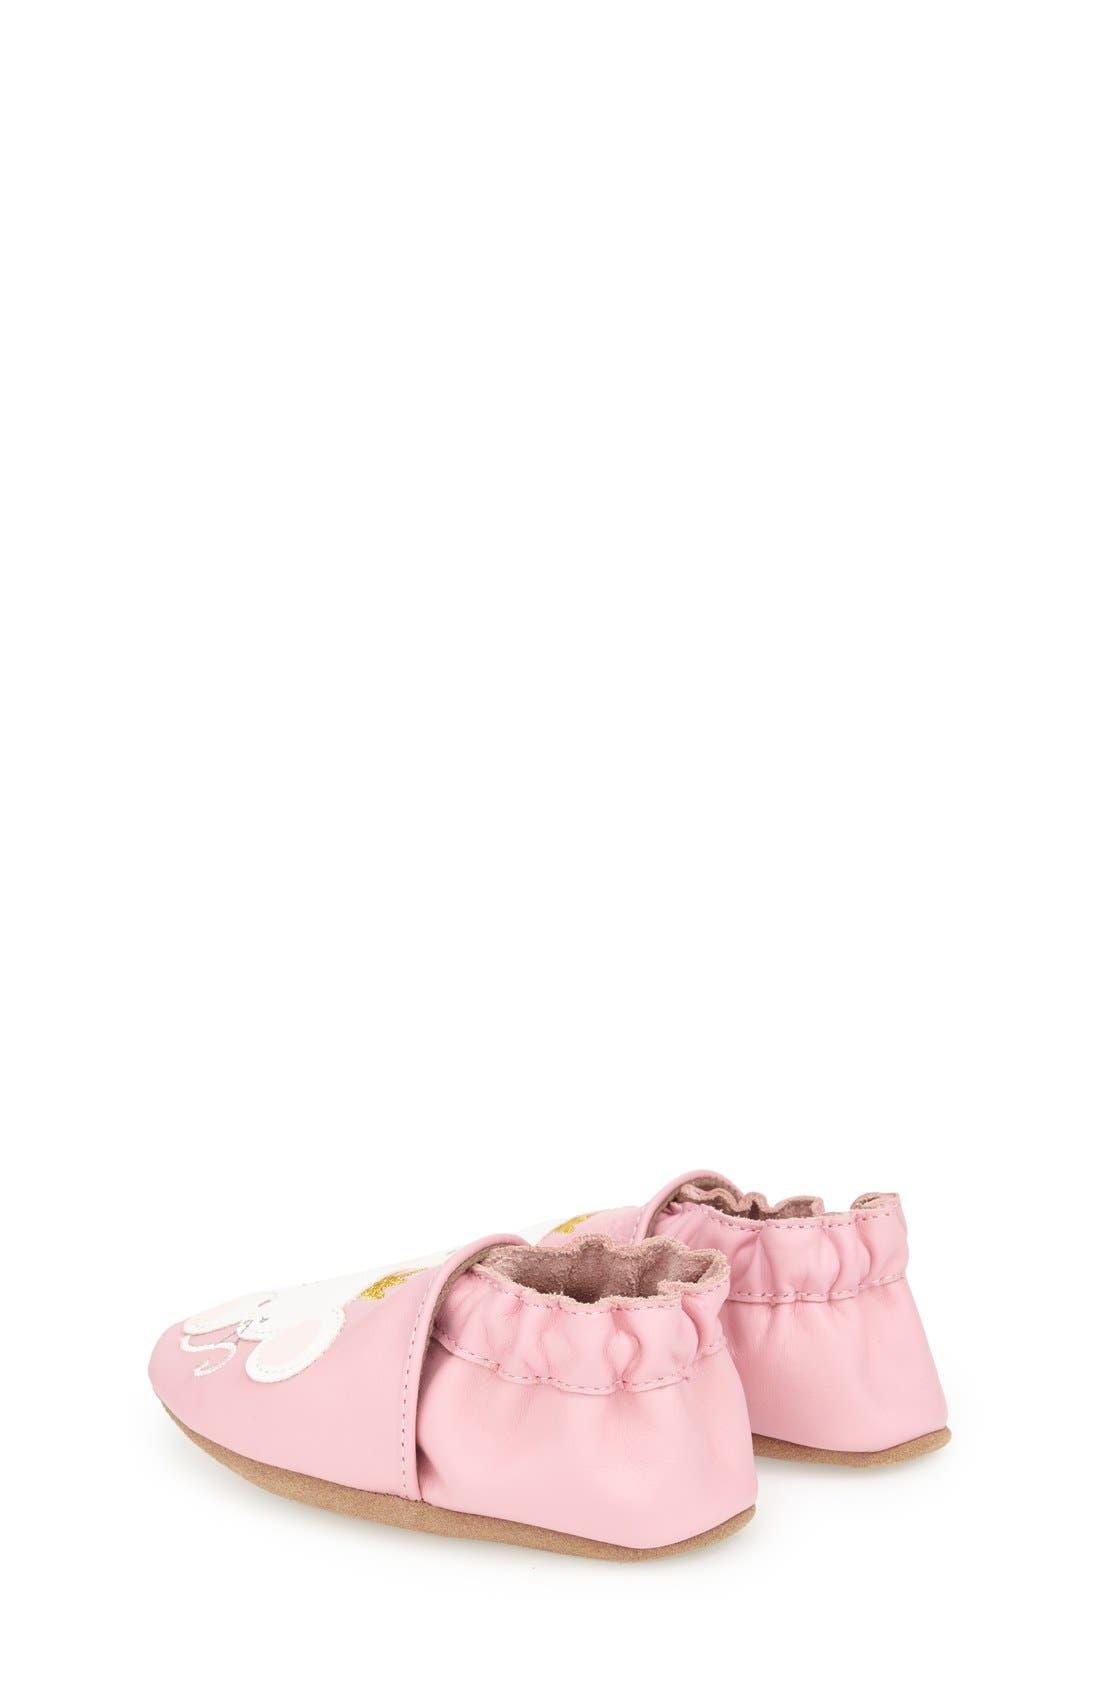 'Princess' Crib Shoe,                             Alternate thumbnail 2, color,                             Prism Pink Leather